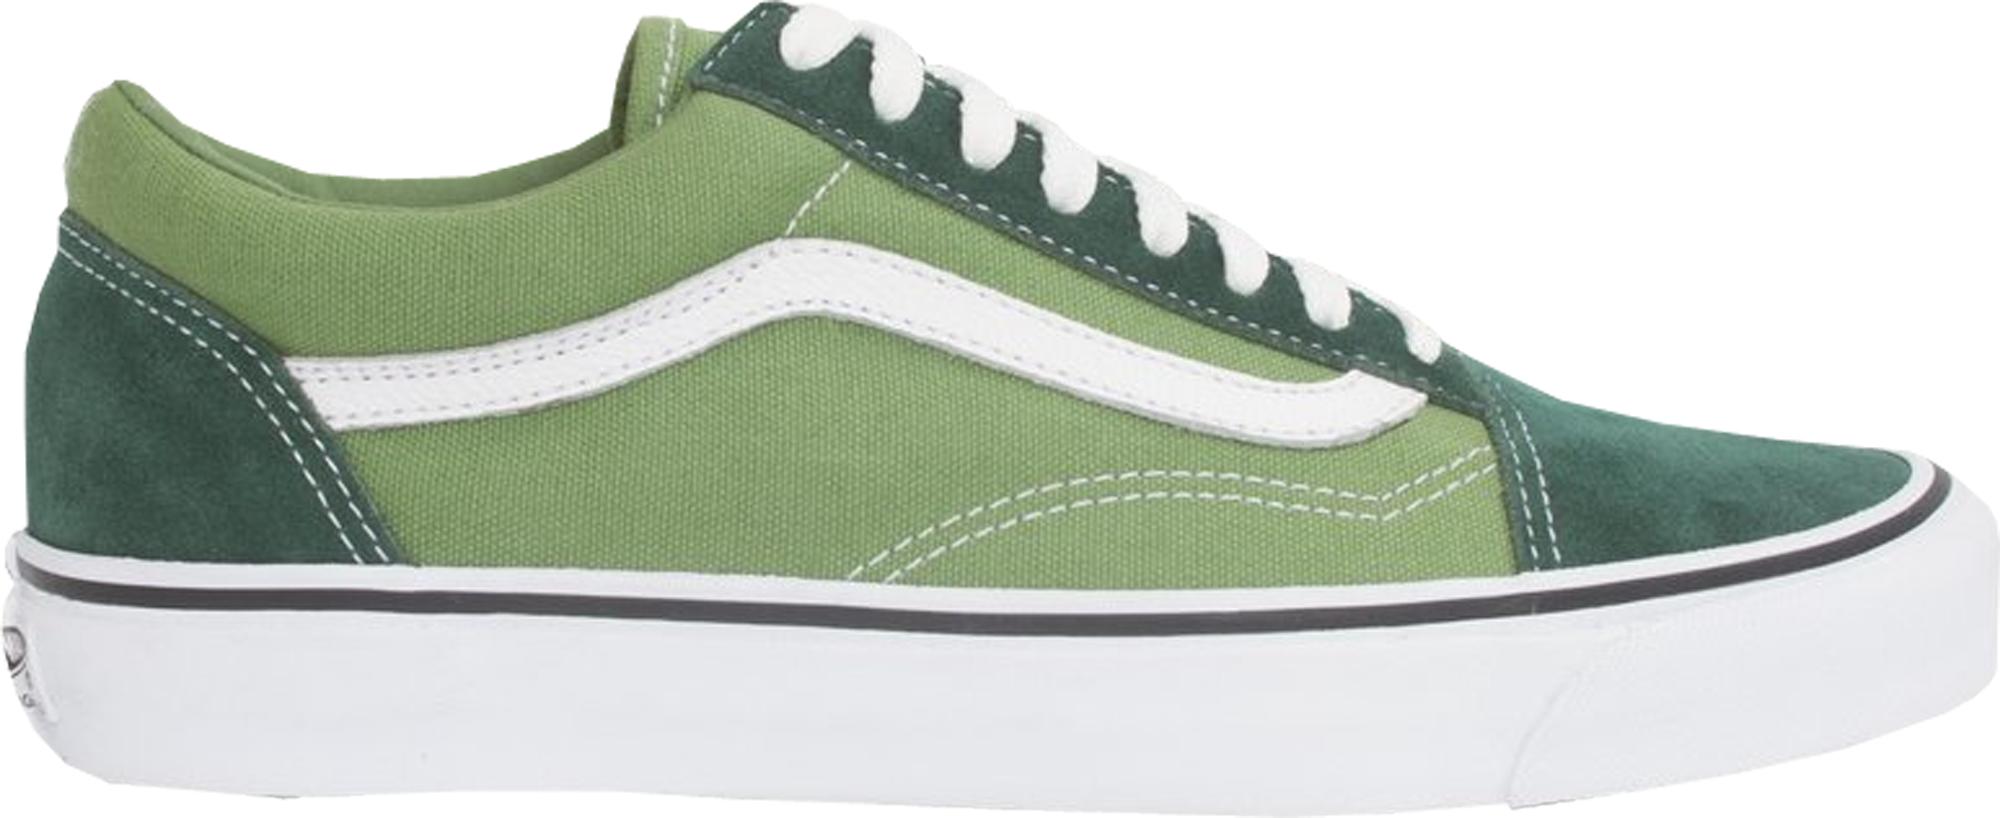 Vans Old Skool JJJJOUND Green - VN0A36C8MC7